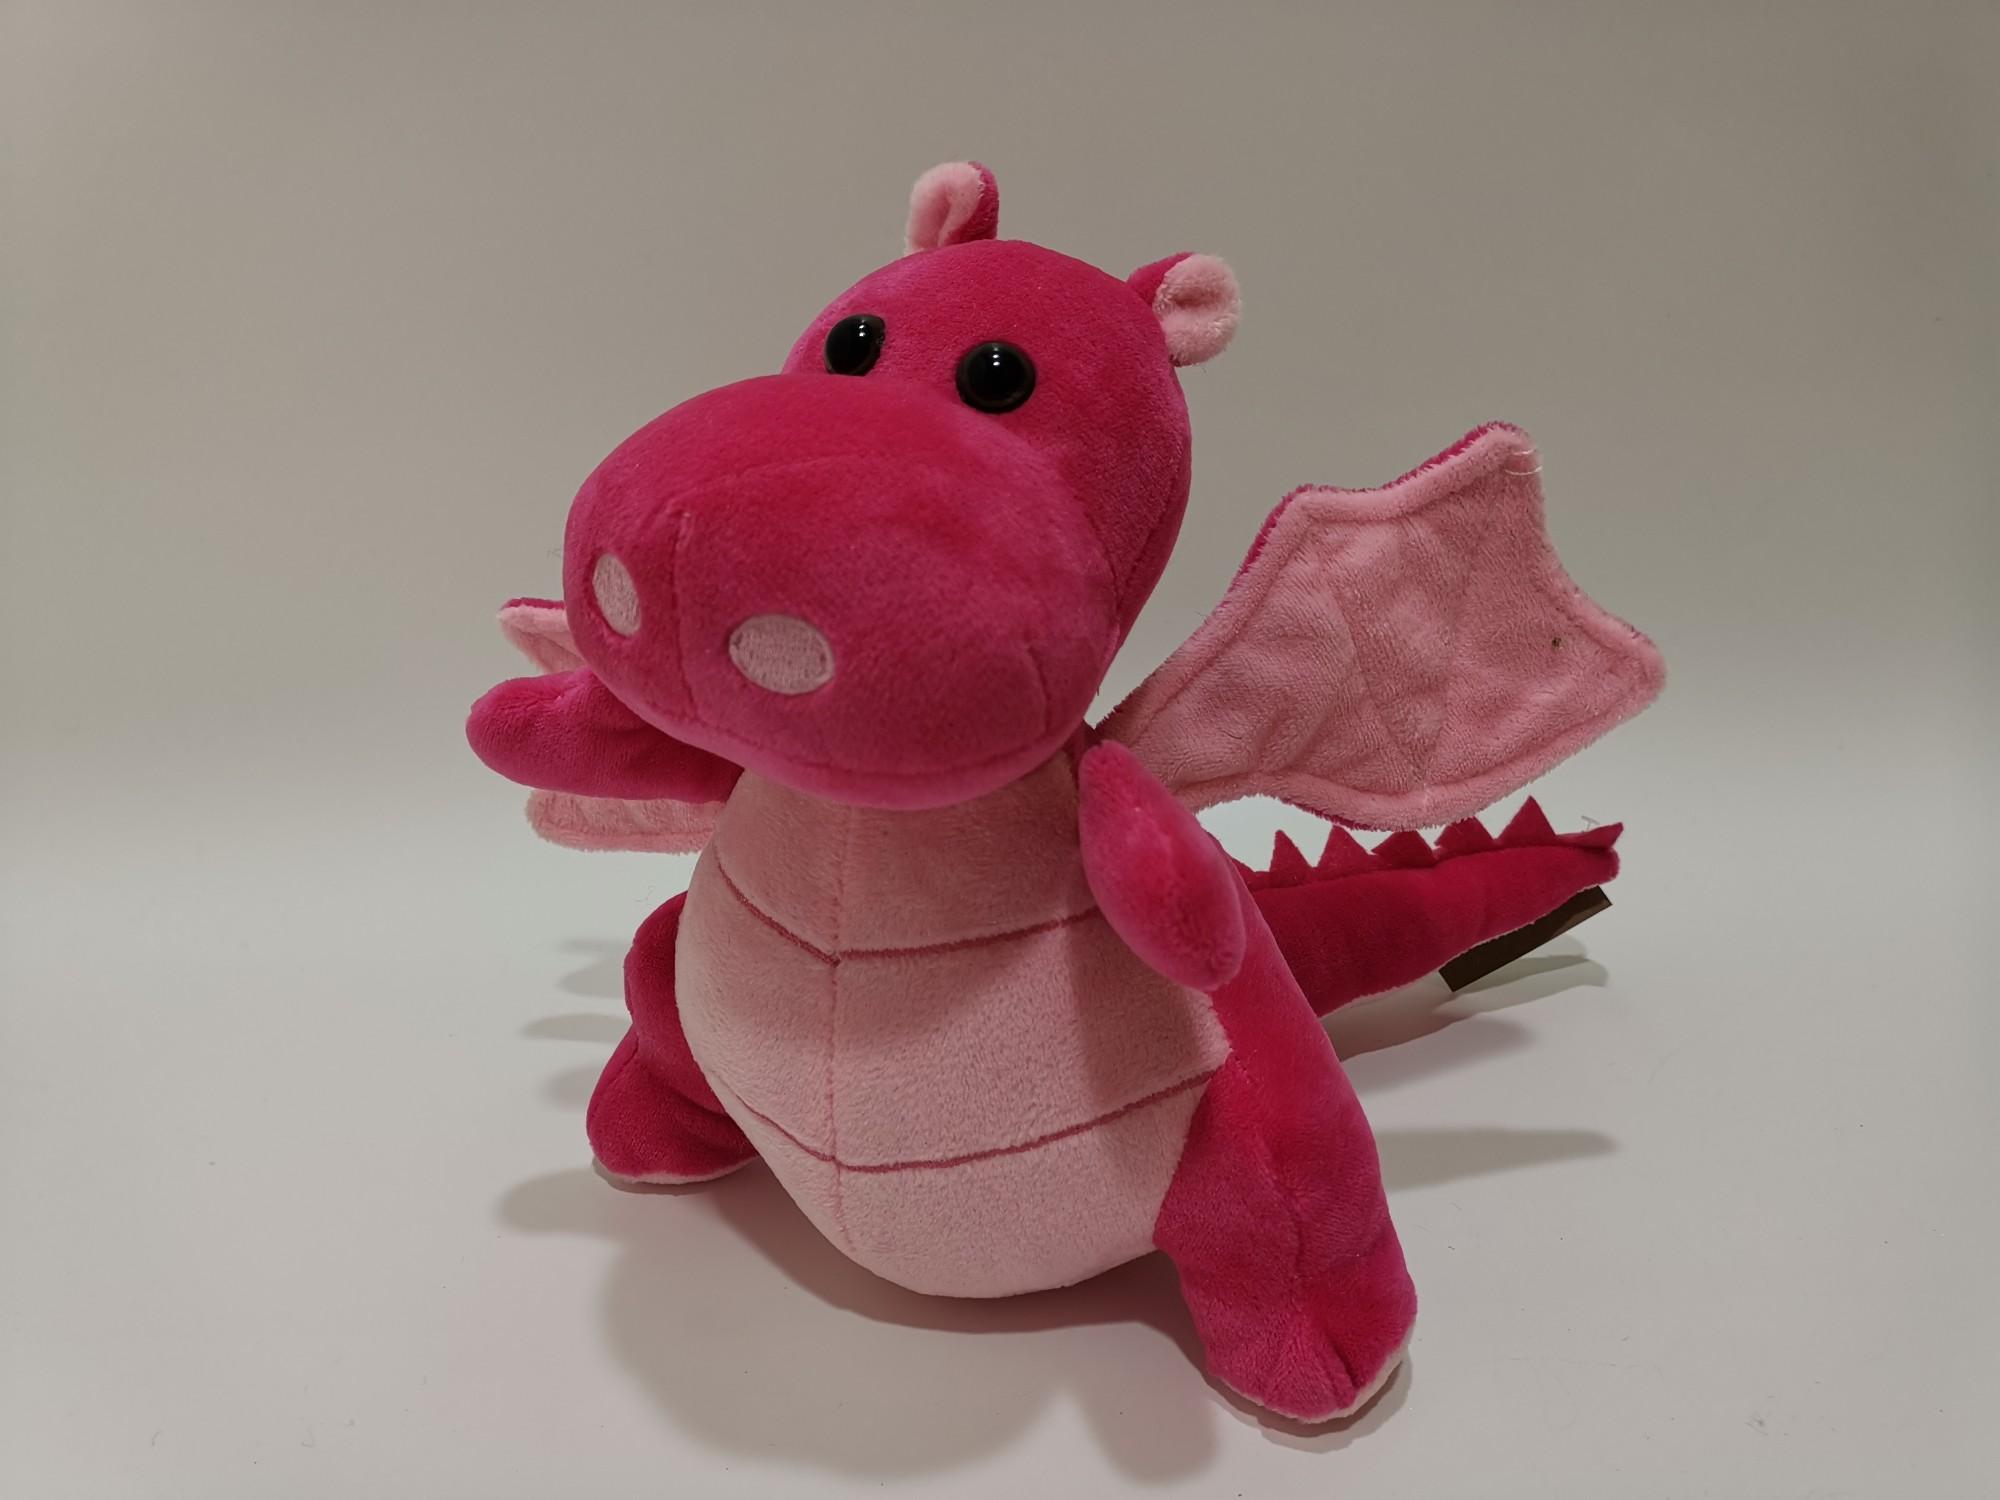 Hot Sale Stuffed Plush Animal Red Cute Baby Dragon Toy